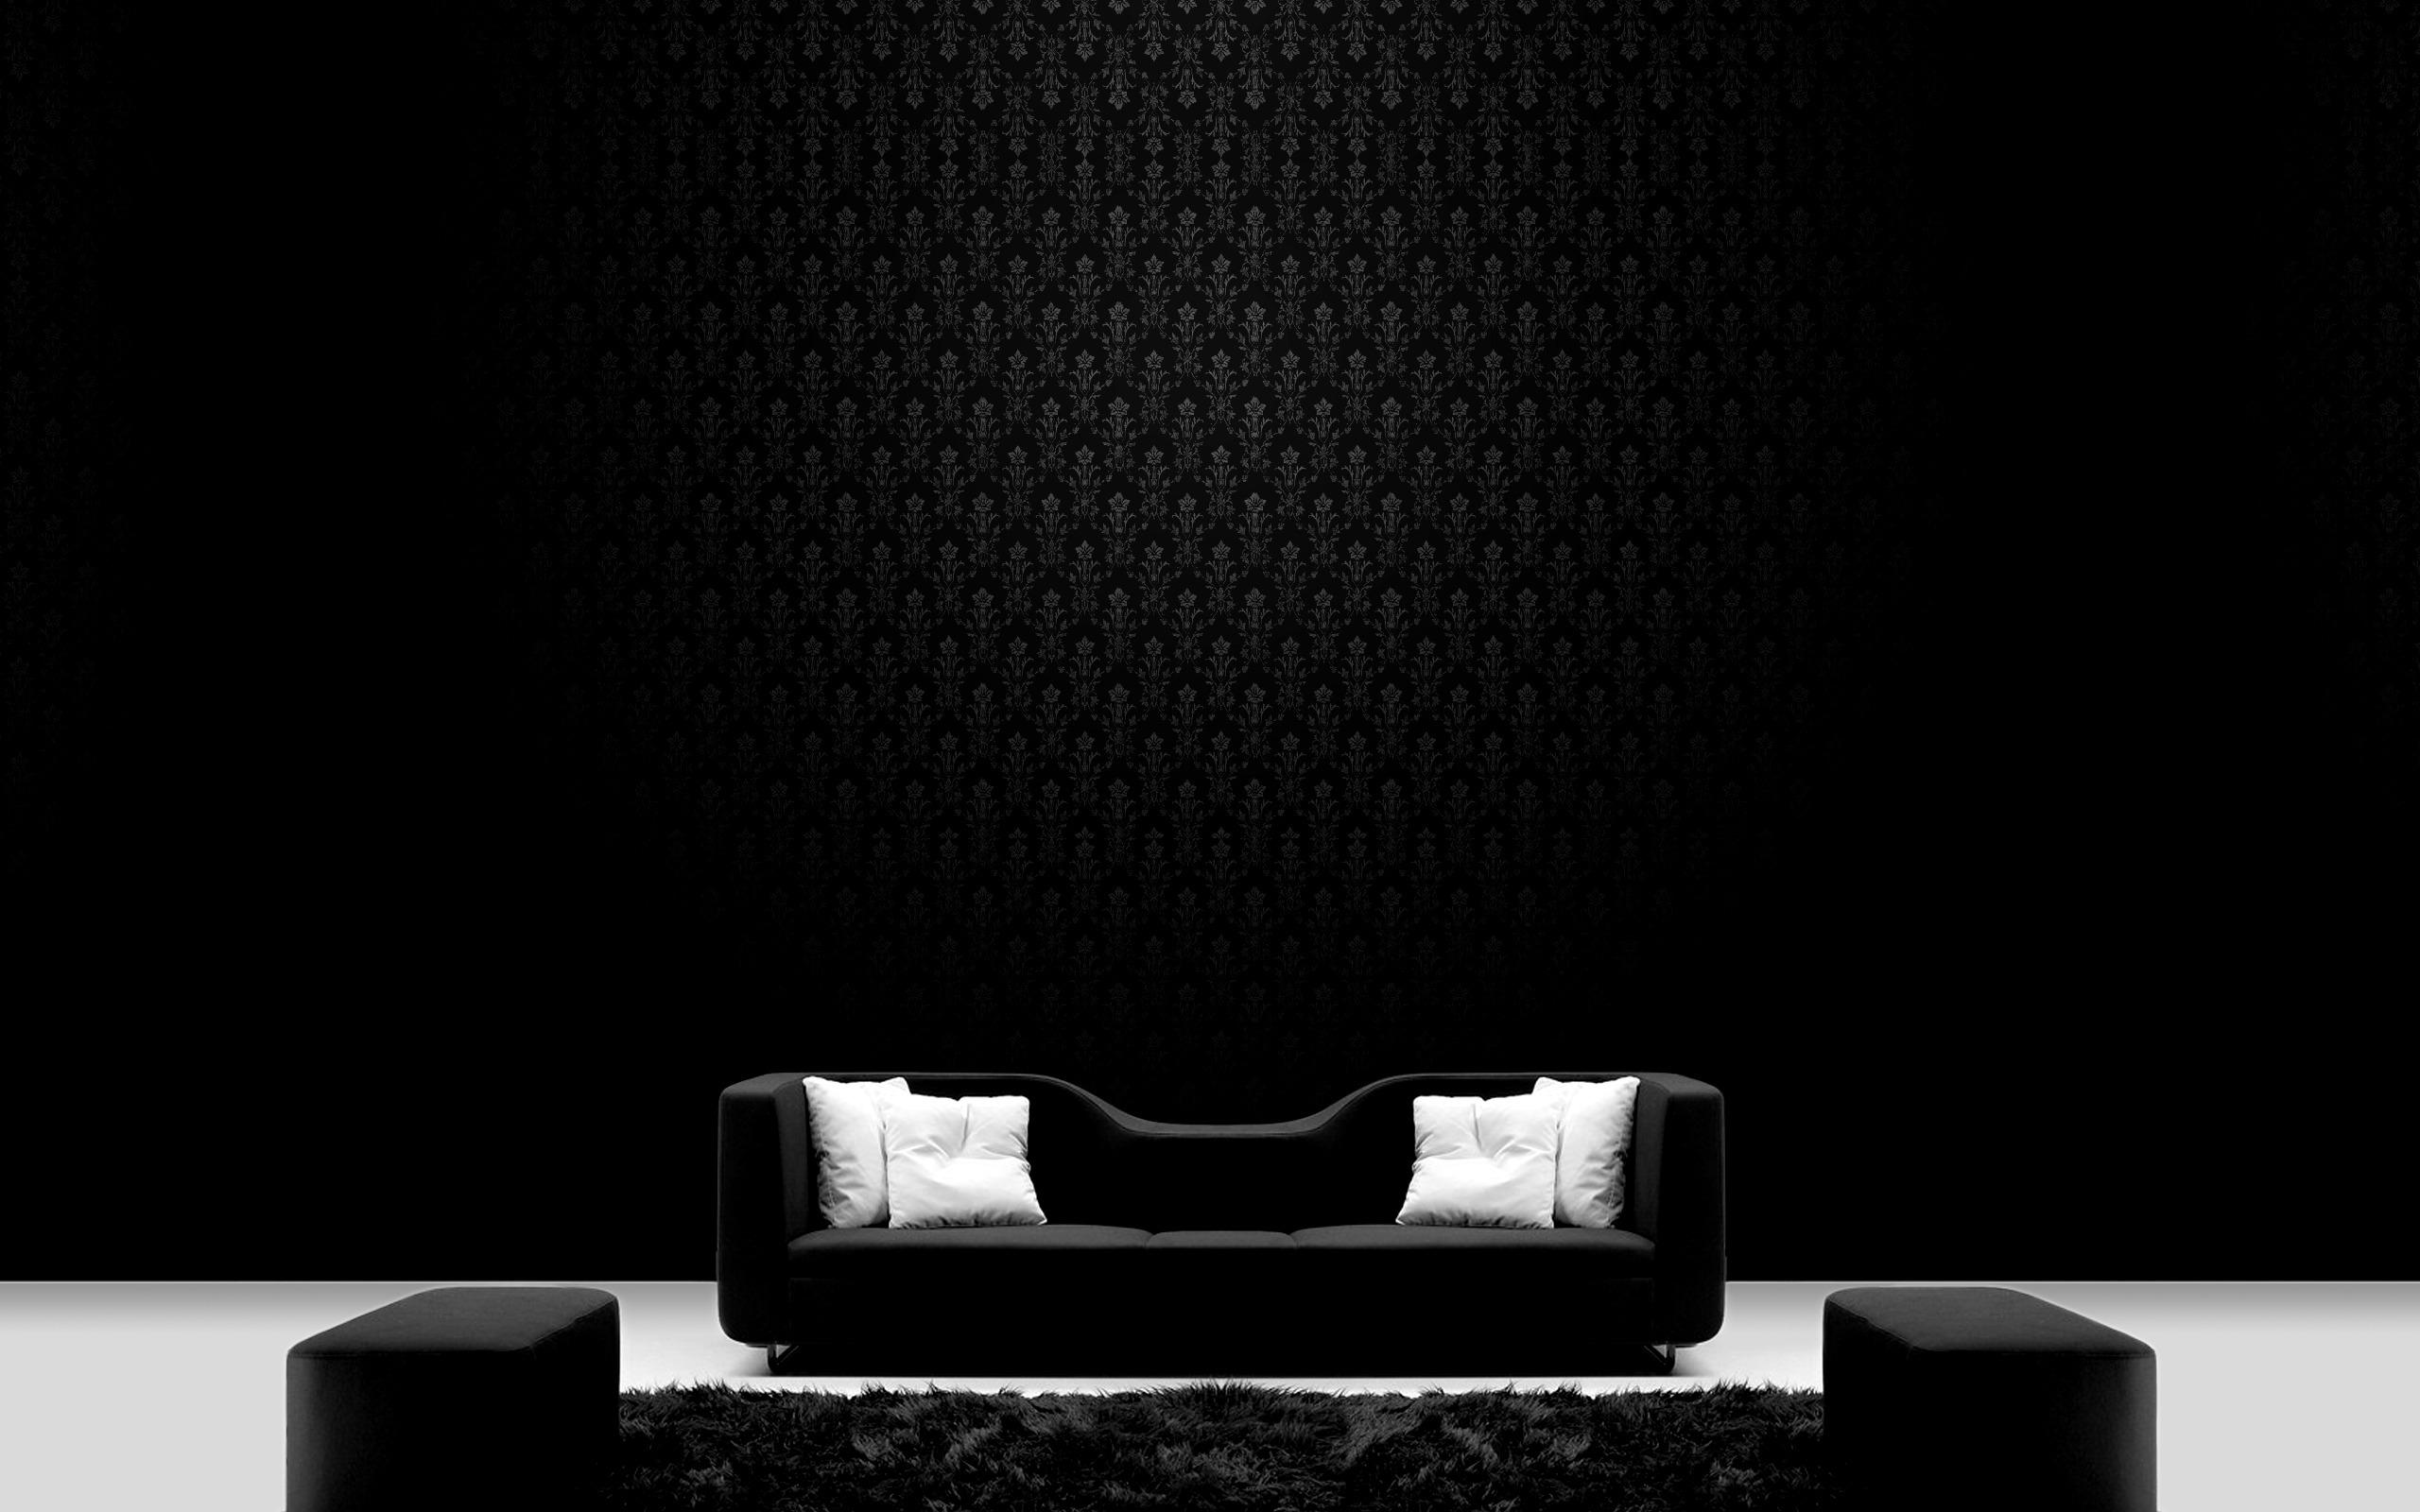 furniture computer wallpapers desktop - photo #10